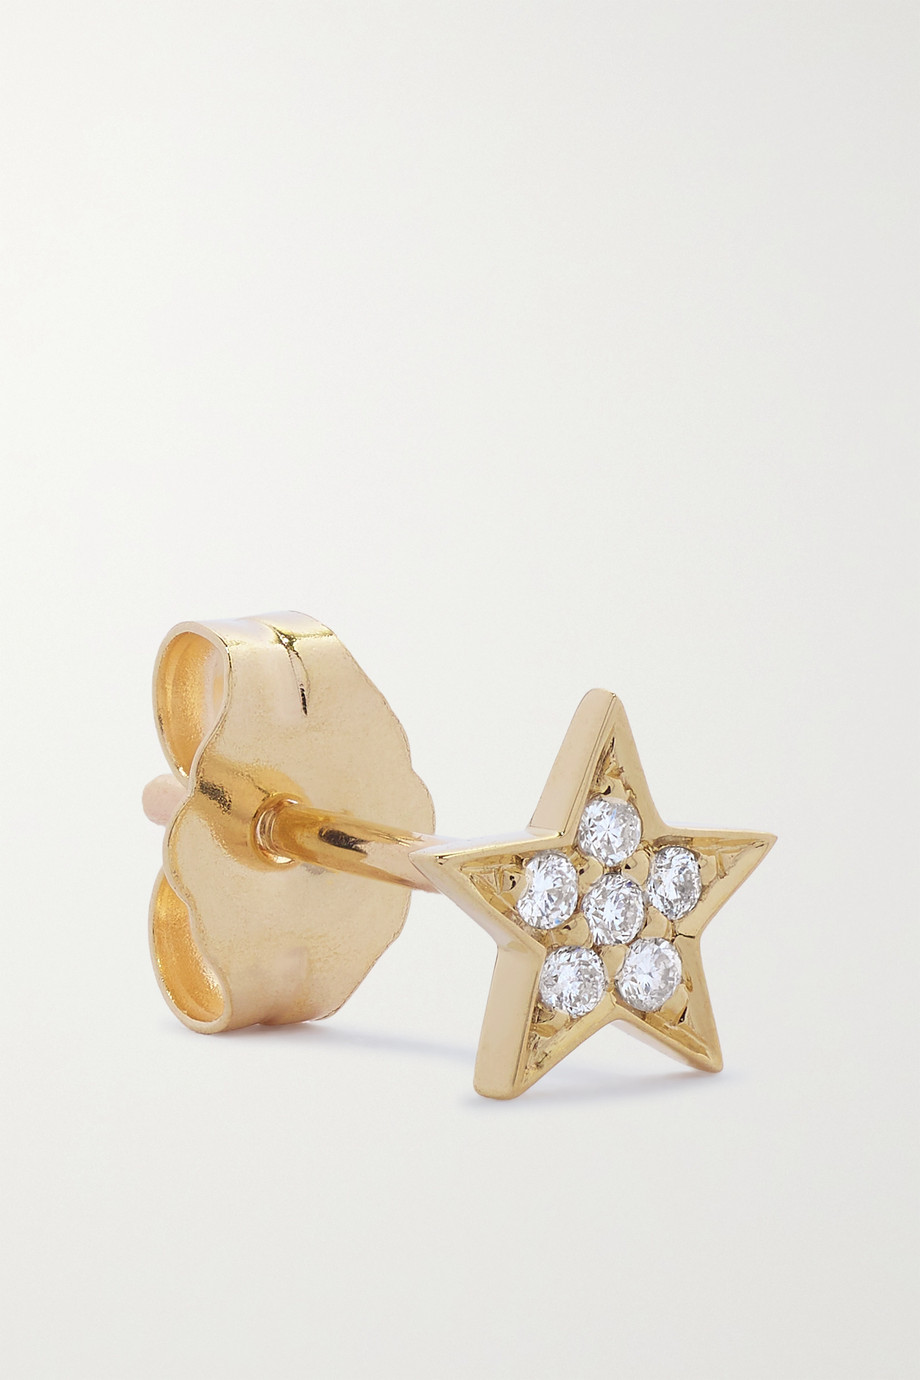 Andrea Fohrman 14-karat gold diamond earring